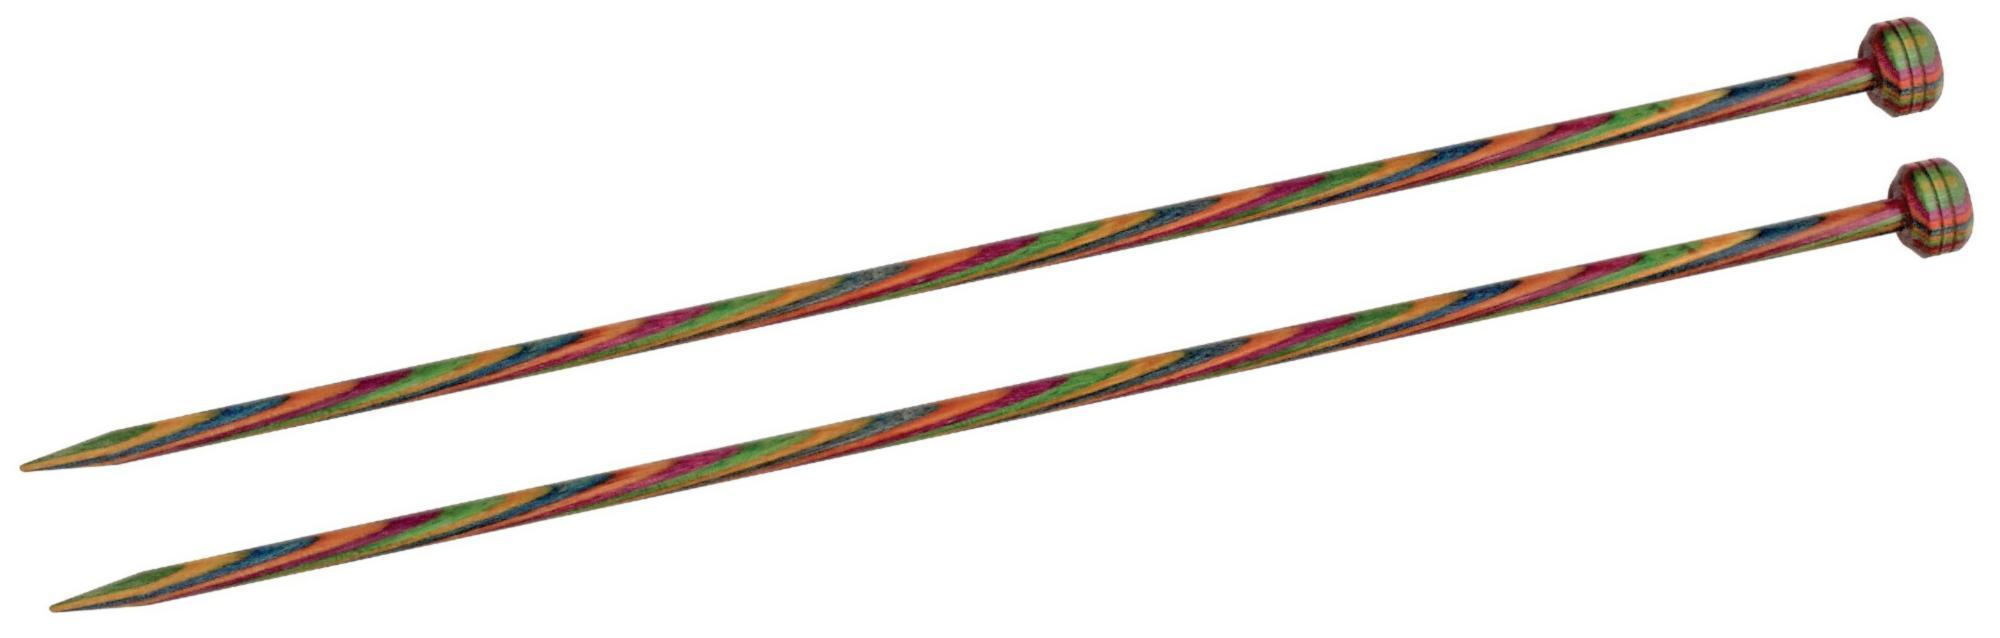 Спицы прямые 40 см Symfonie Wood KnitPro, 20259, 6.00 мм